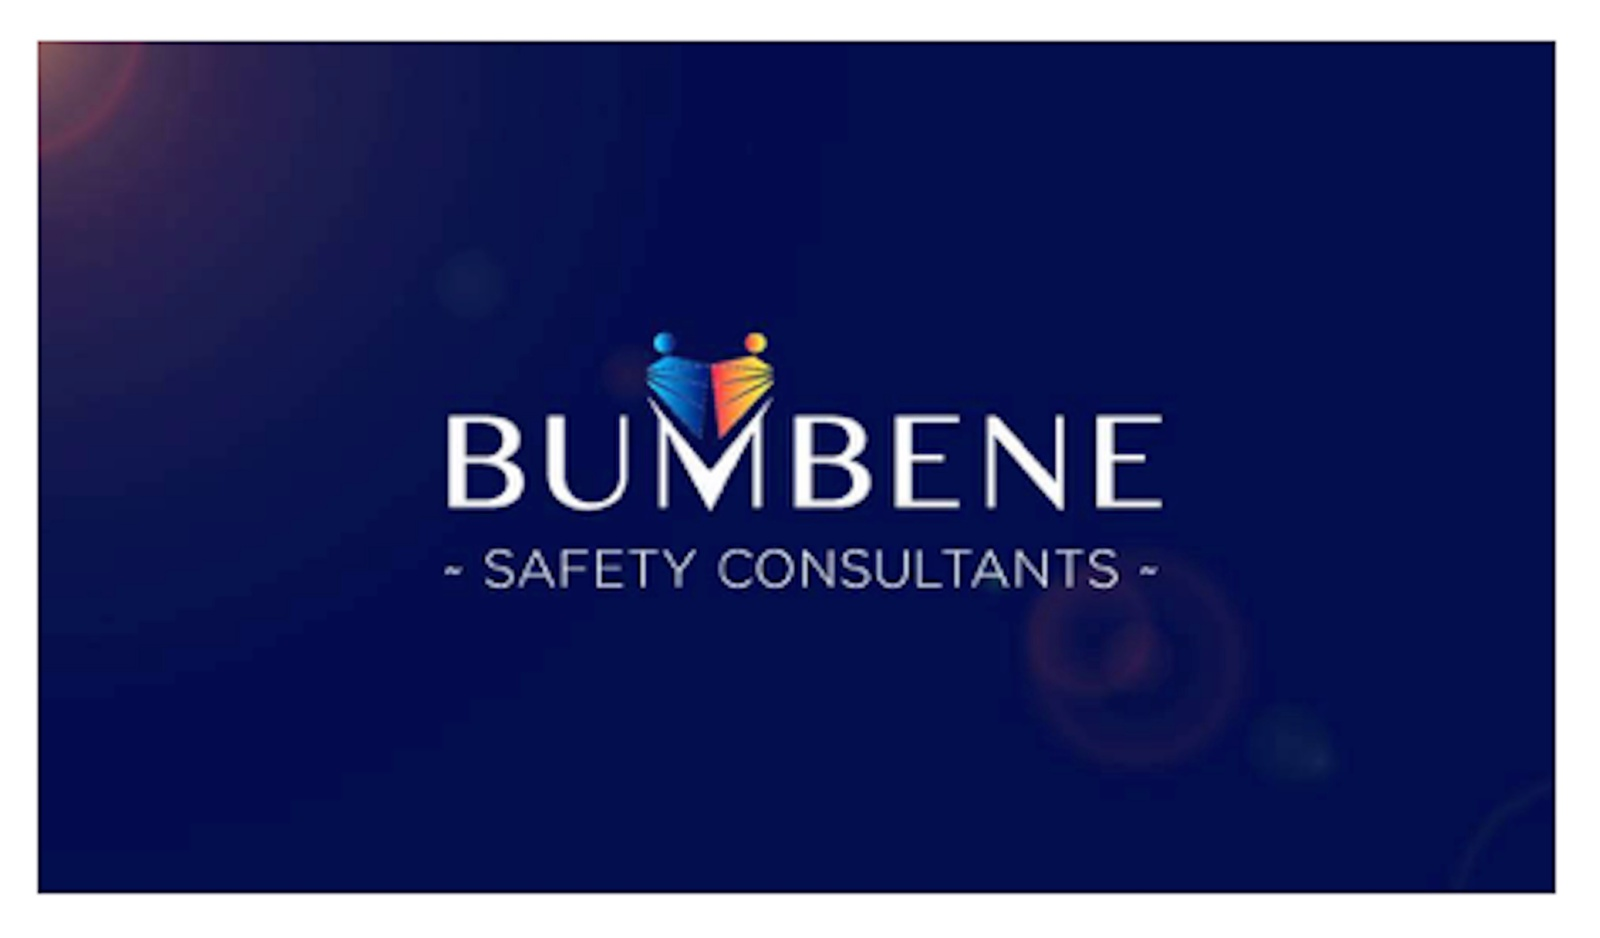 Bumbene